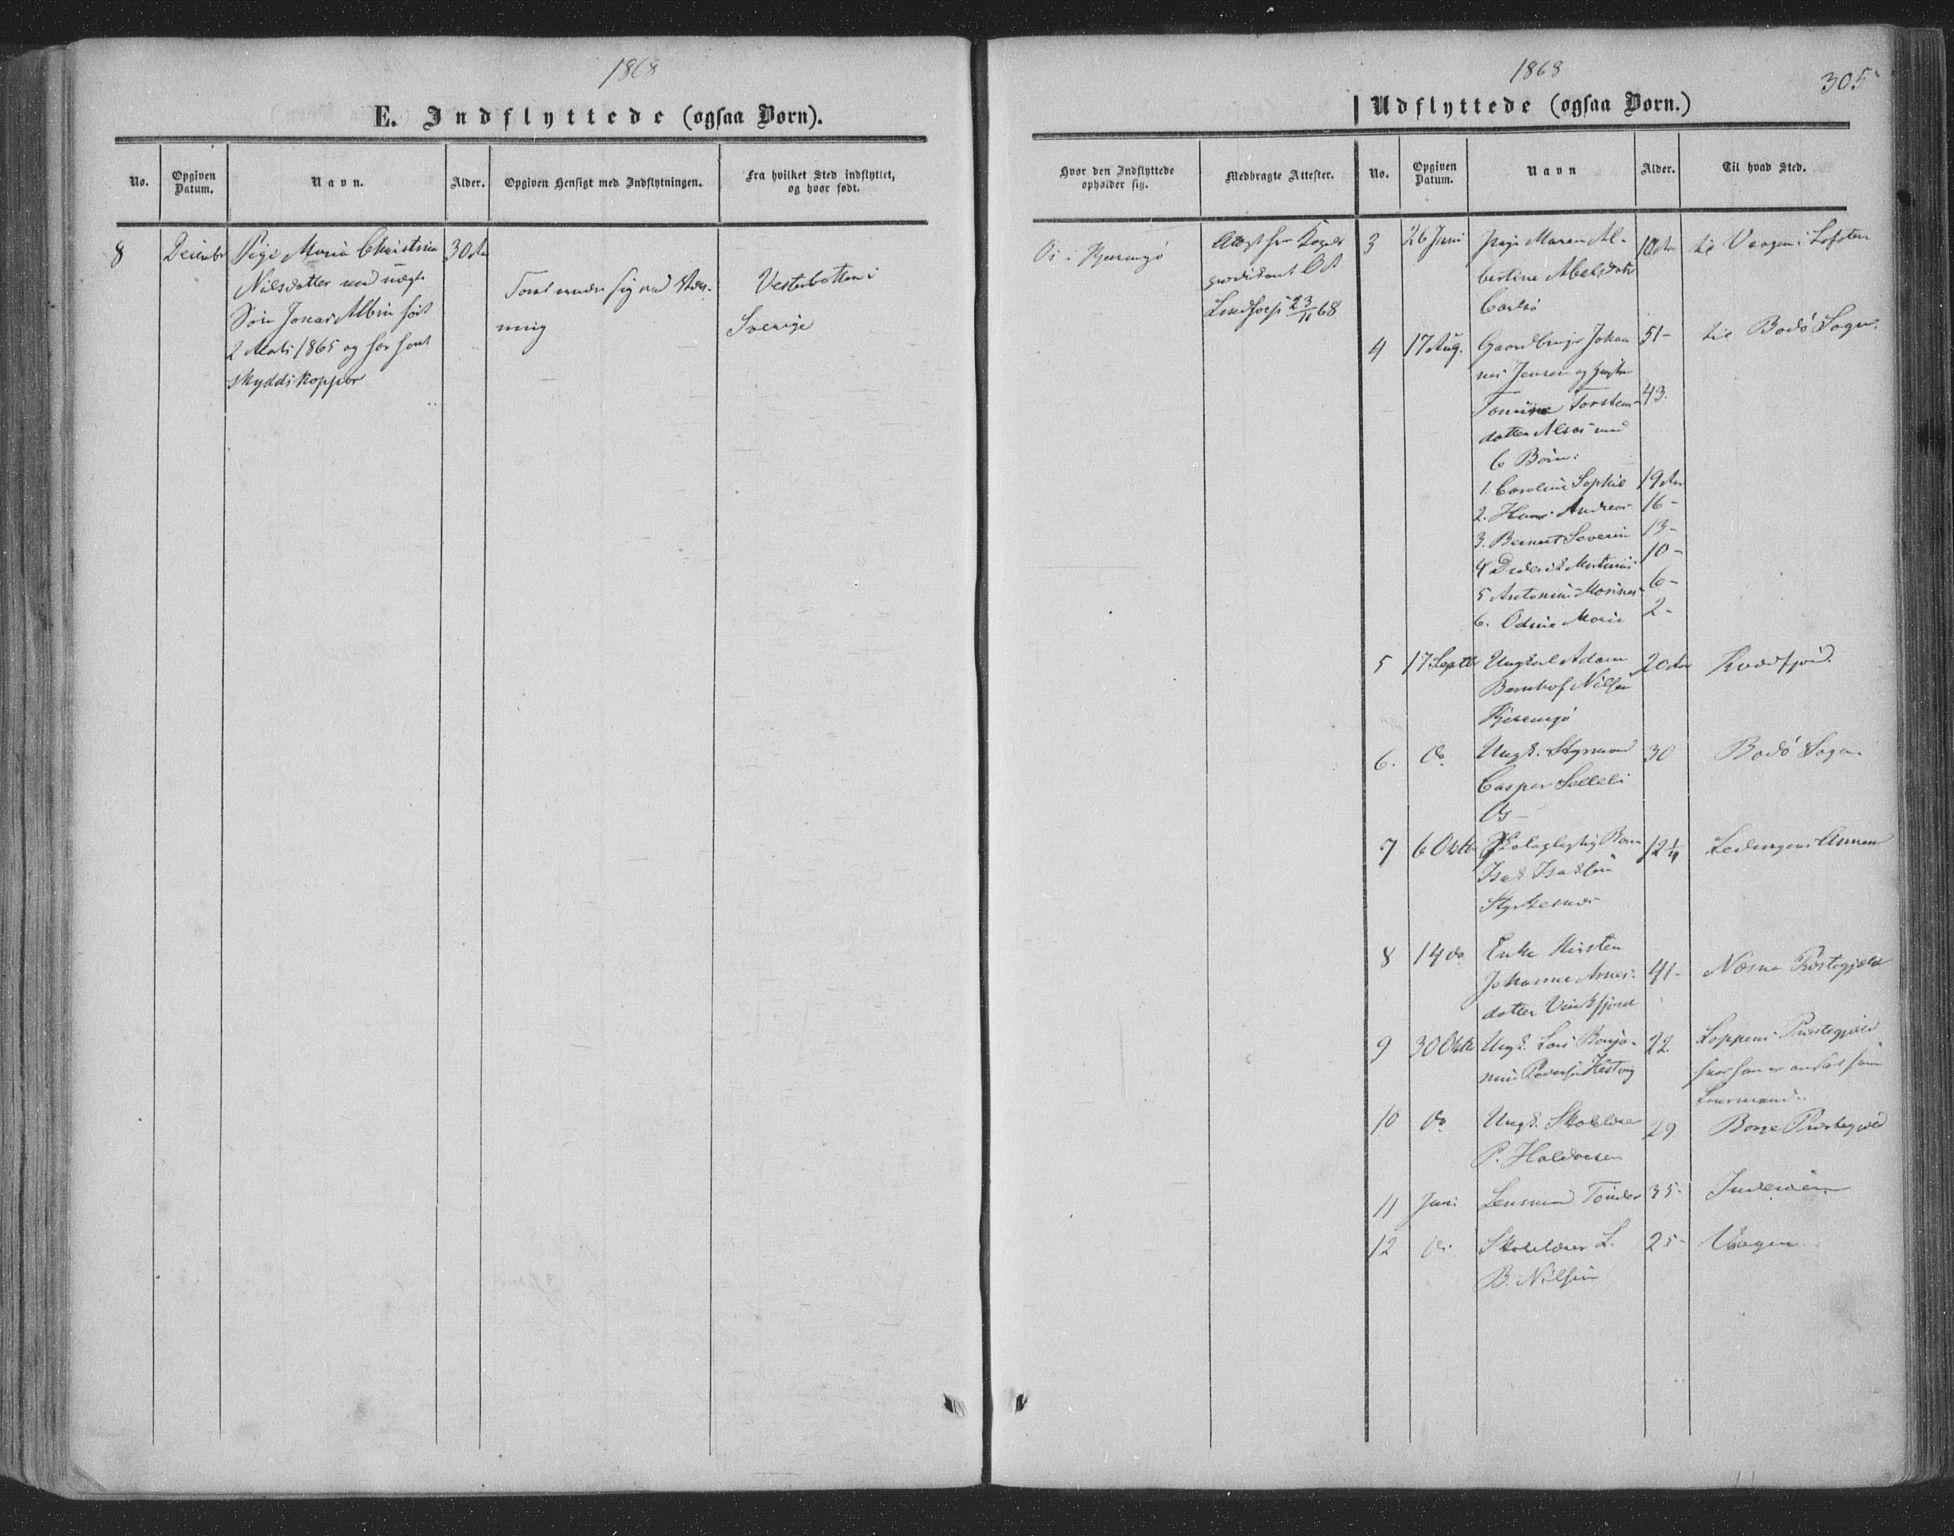 SAT, Ministerialprotokoller, klokkerbøker og fødselsregistre - Nordland, 853/L0770: Ministerialbok nr. 853A09, 1857-1870, s. 305